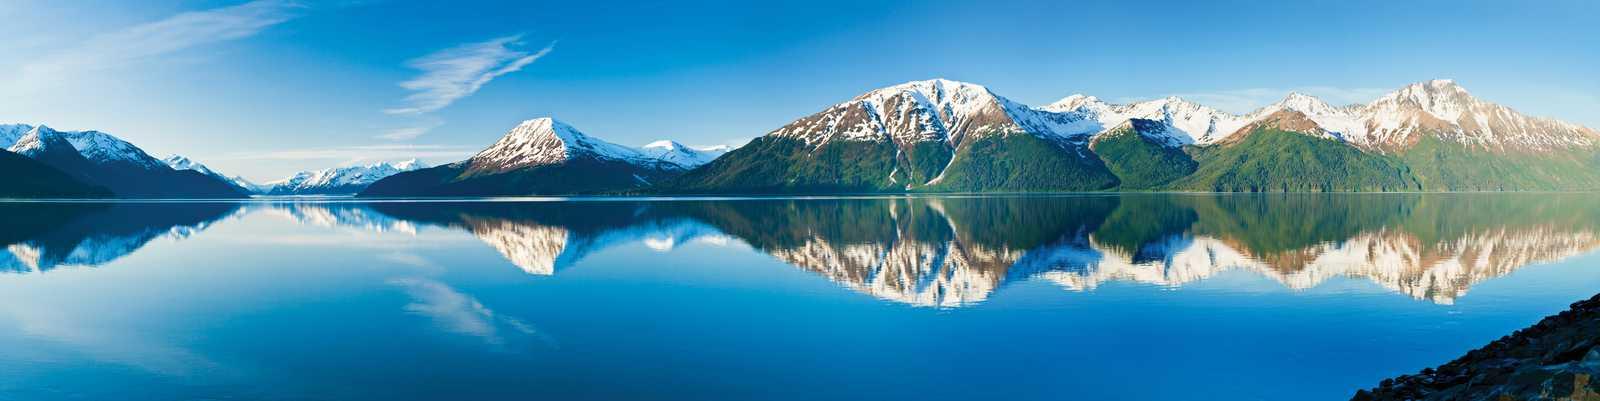 Alaska summer scenic, panoramic, Turnagain Arm, Kenai Mountains, high tide, from near Bird Pt. Chugach SP